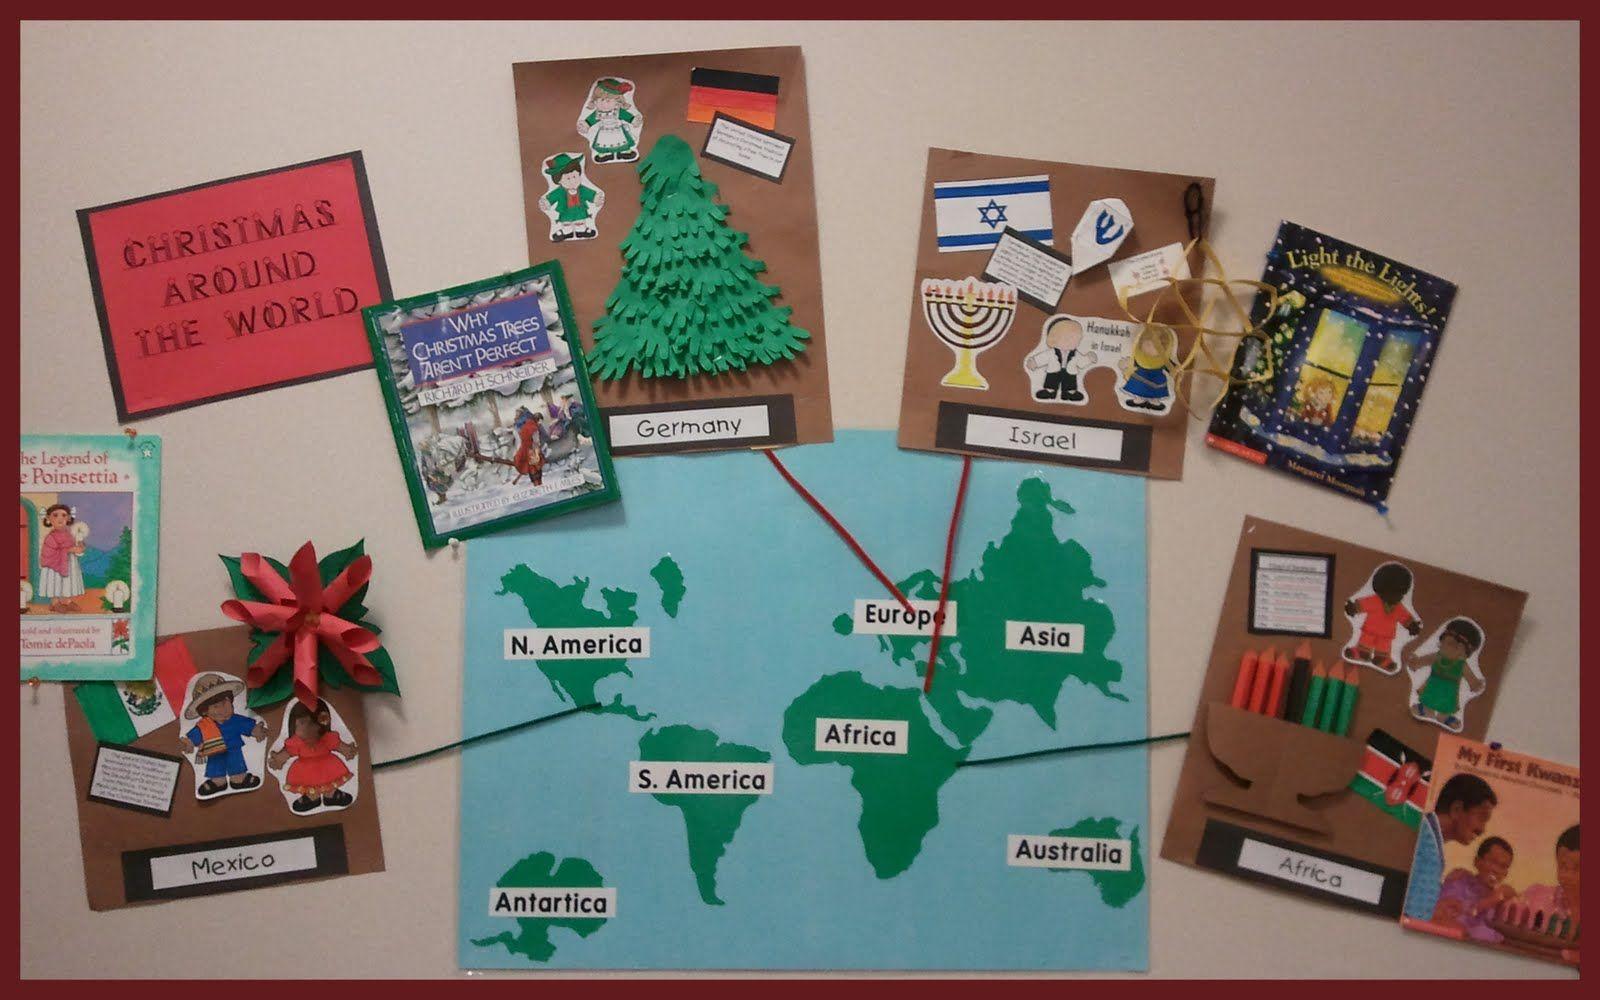 Christmas/holidays around the world. I would change